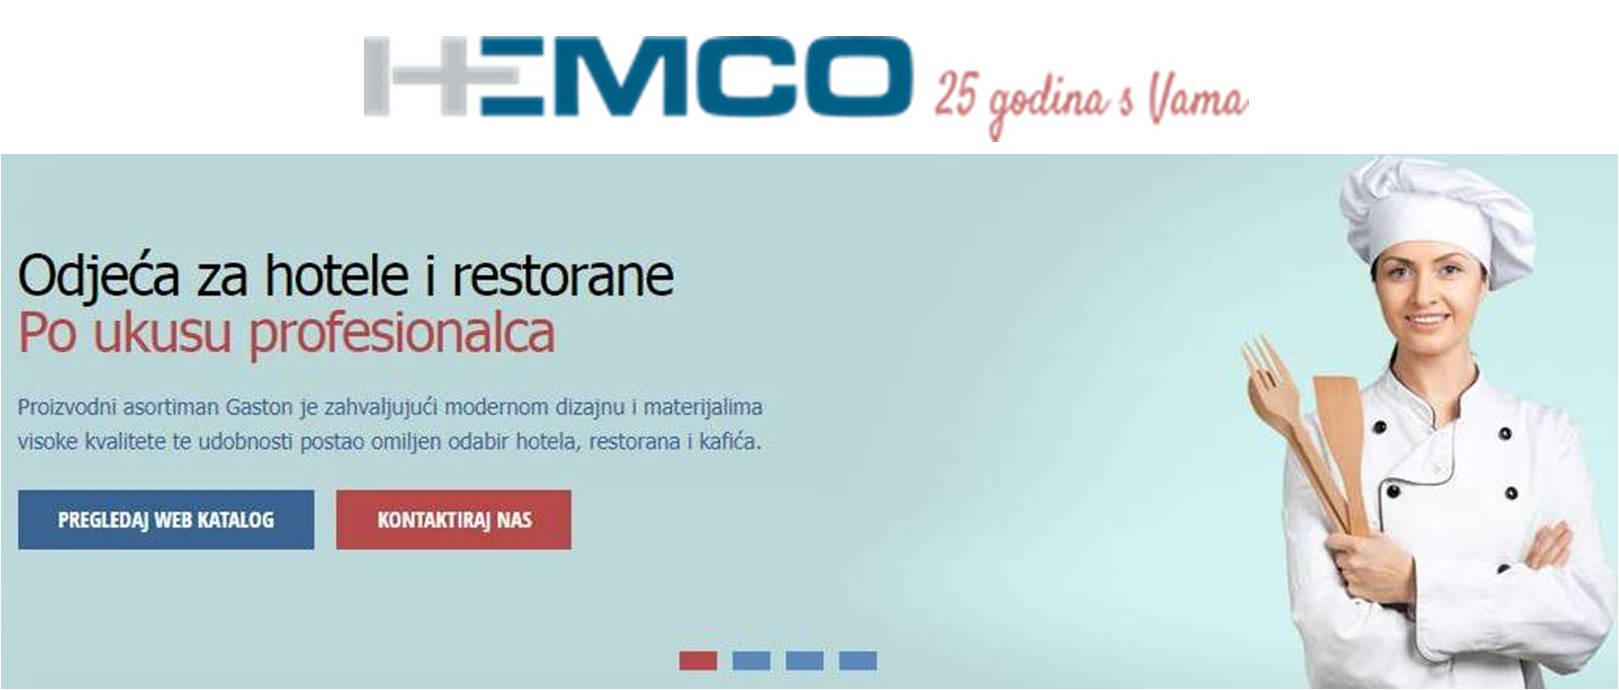 HEMCO WEB 2